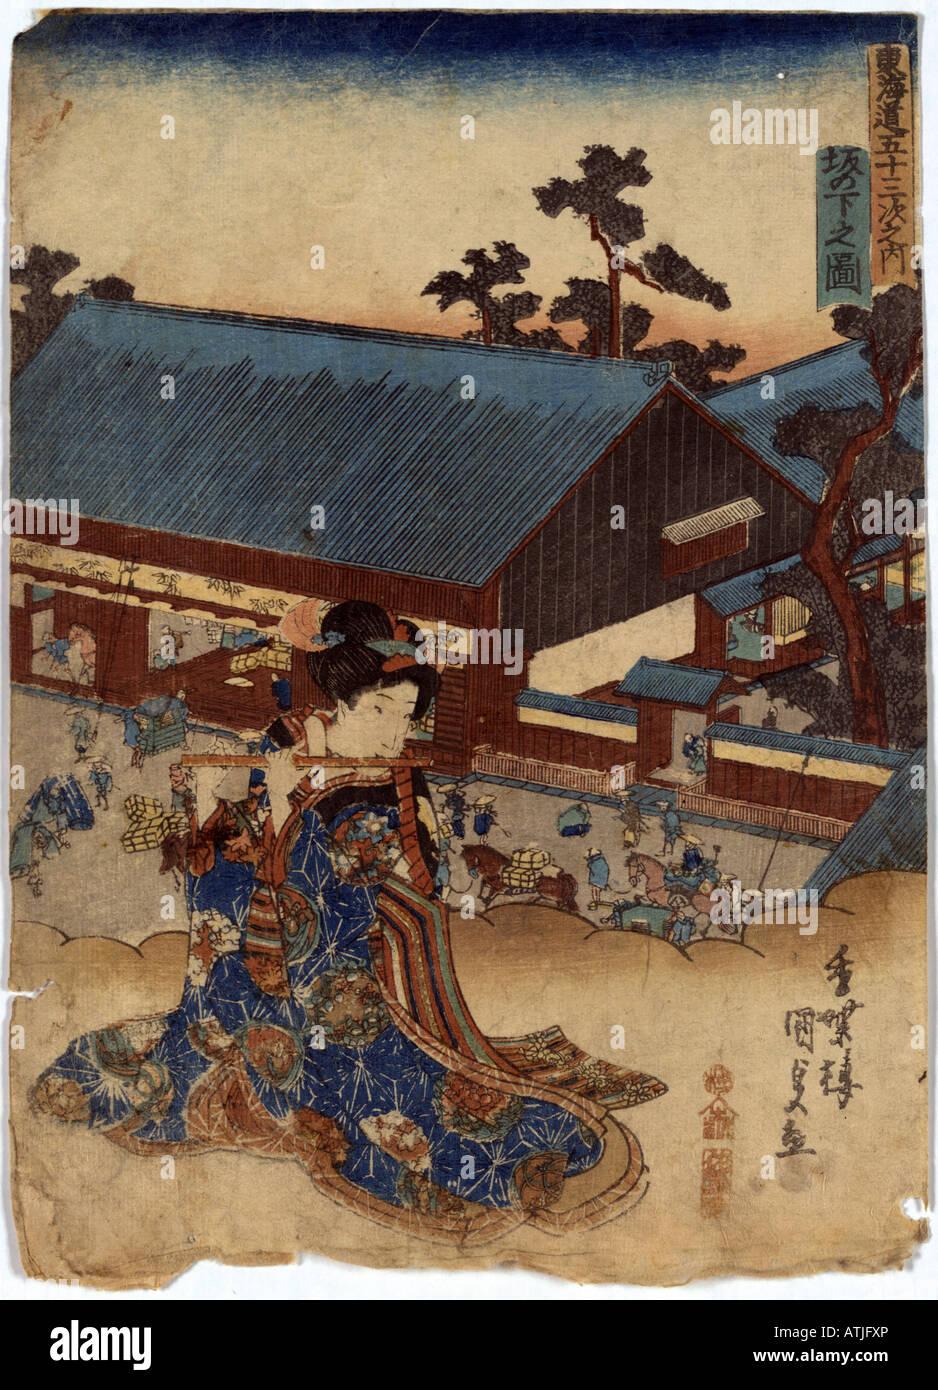 Japanese Ukiyo e print - Stock Image